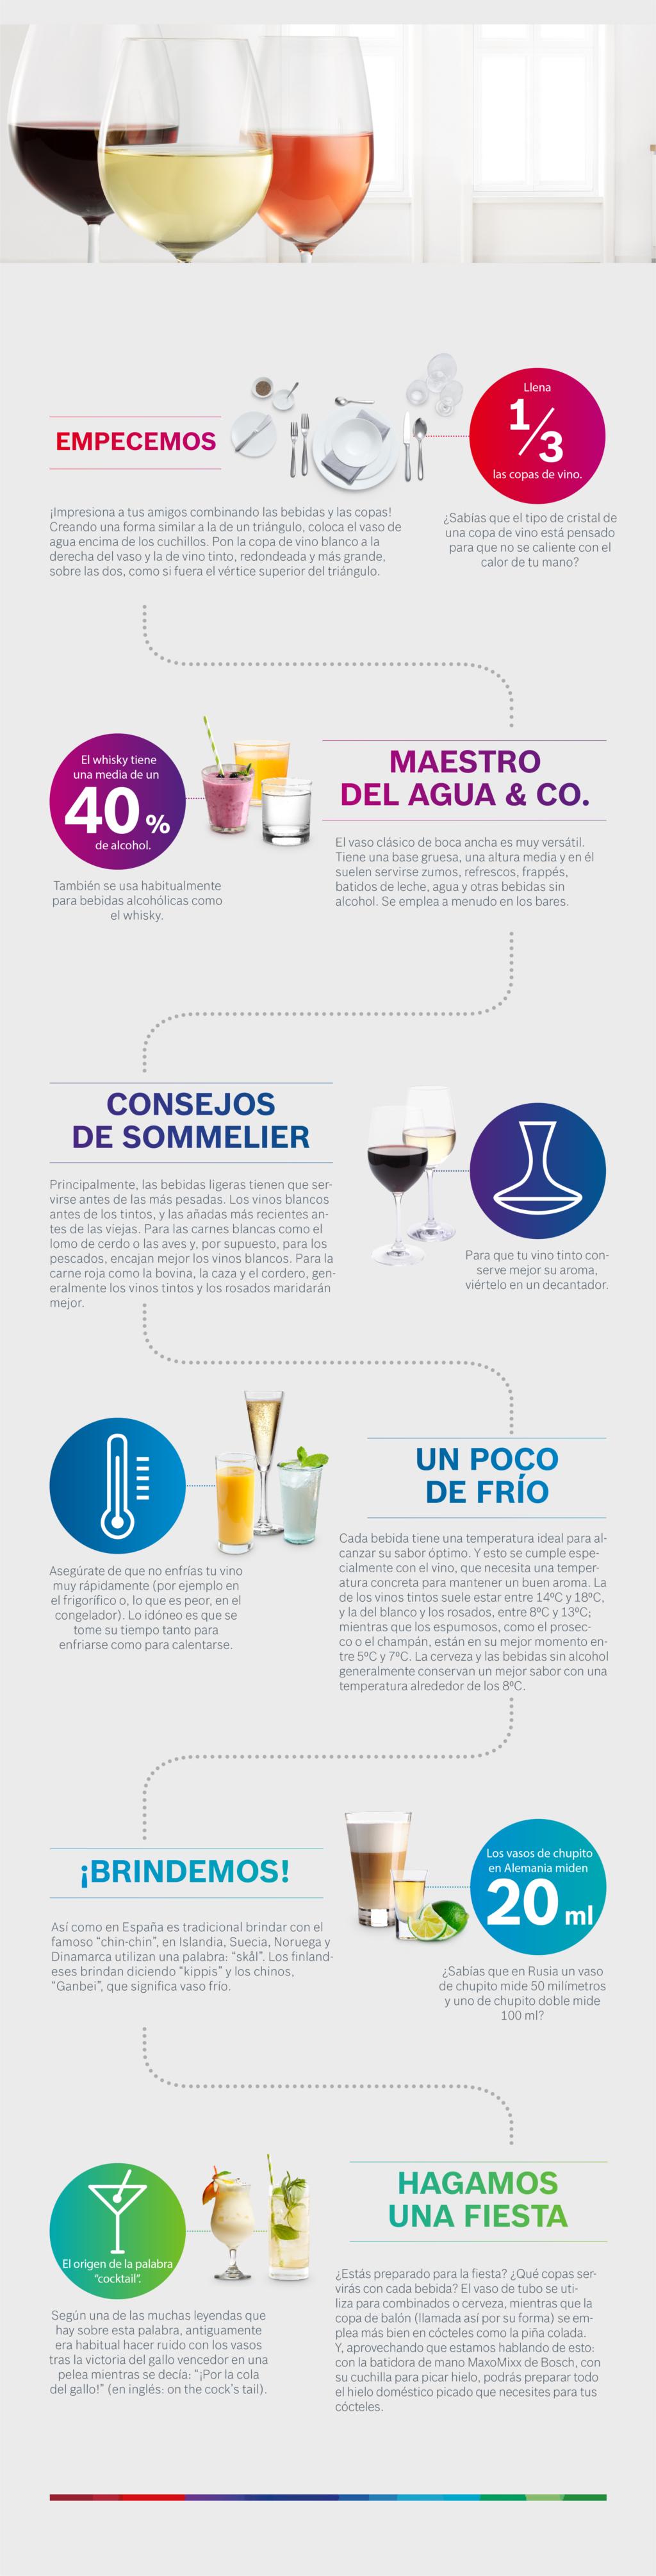 infografía sobre cristalería